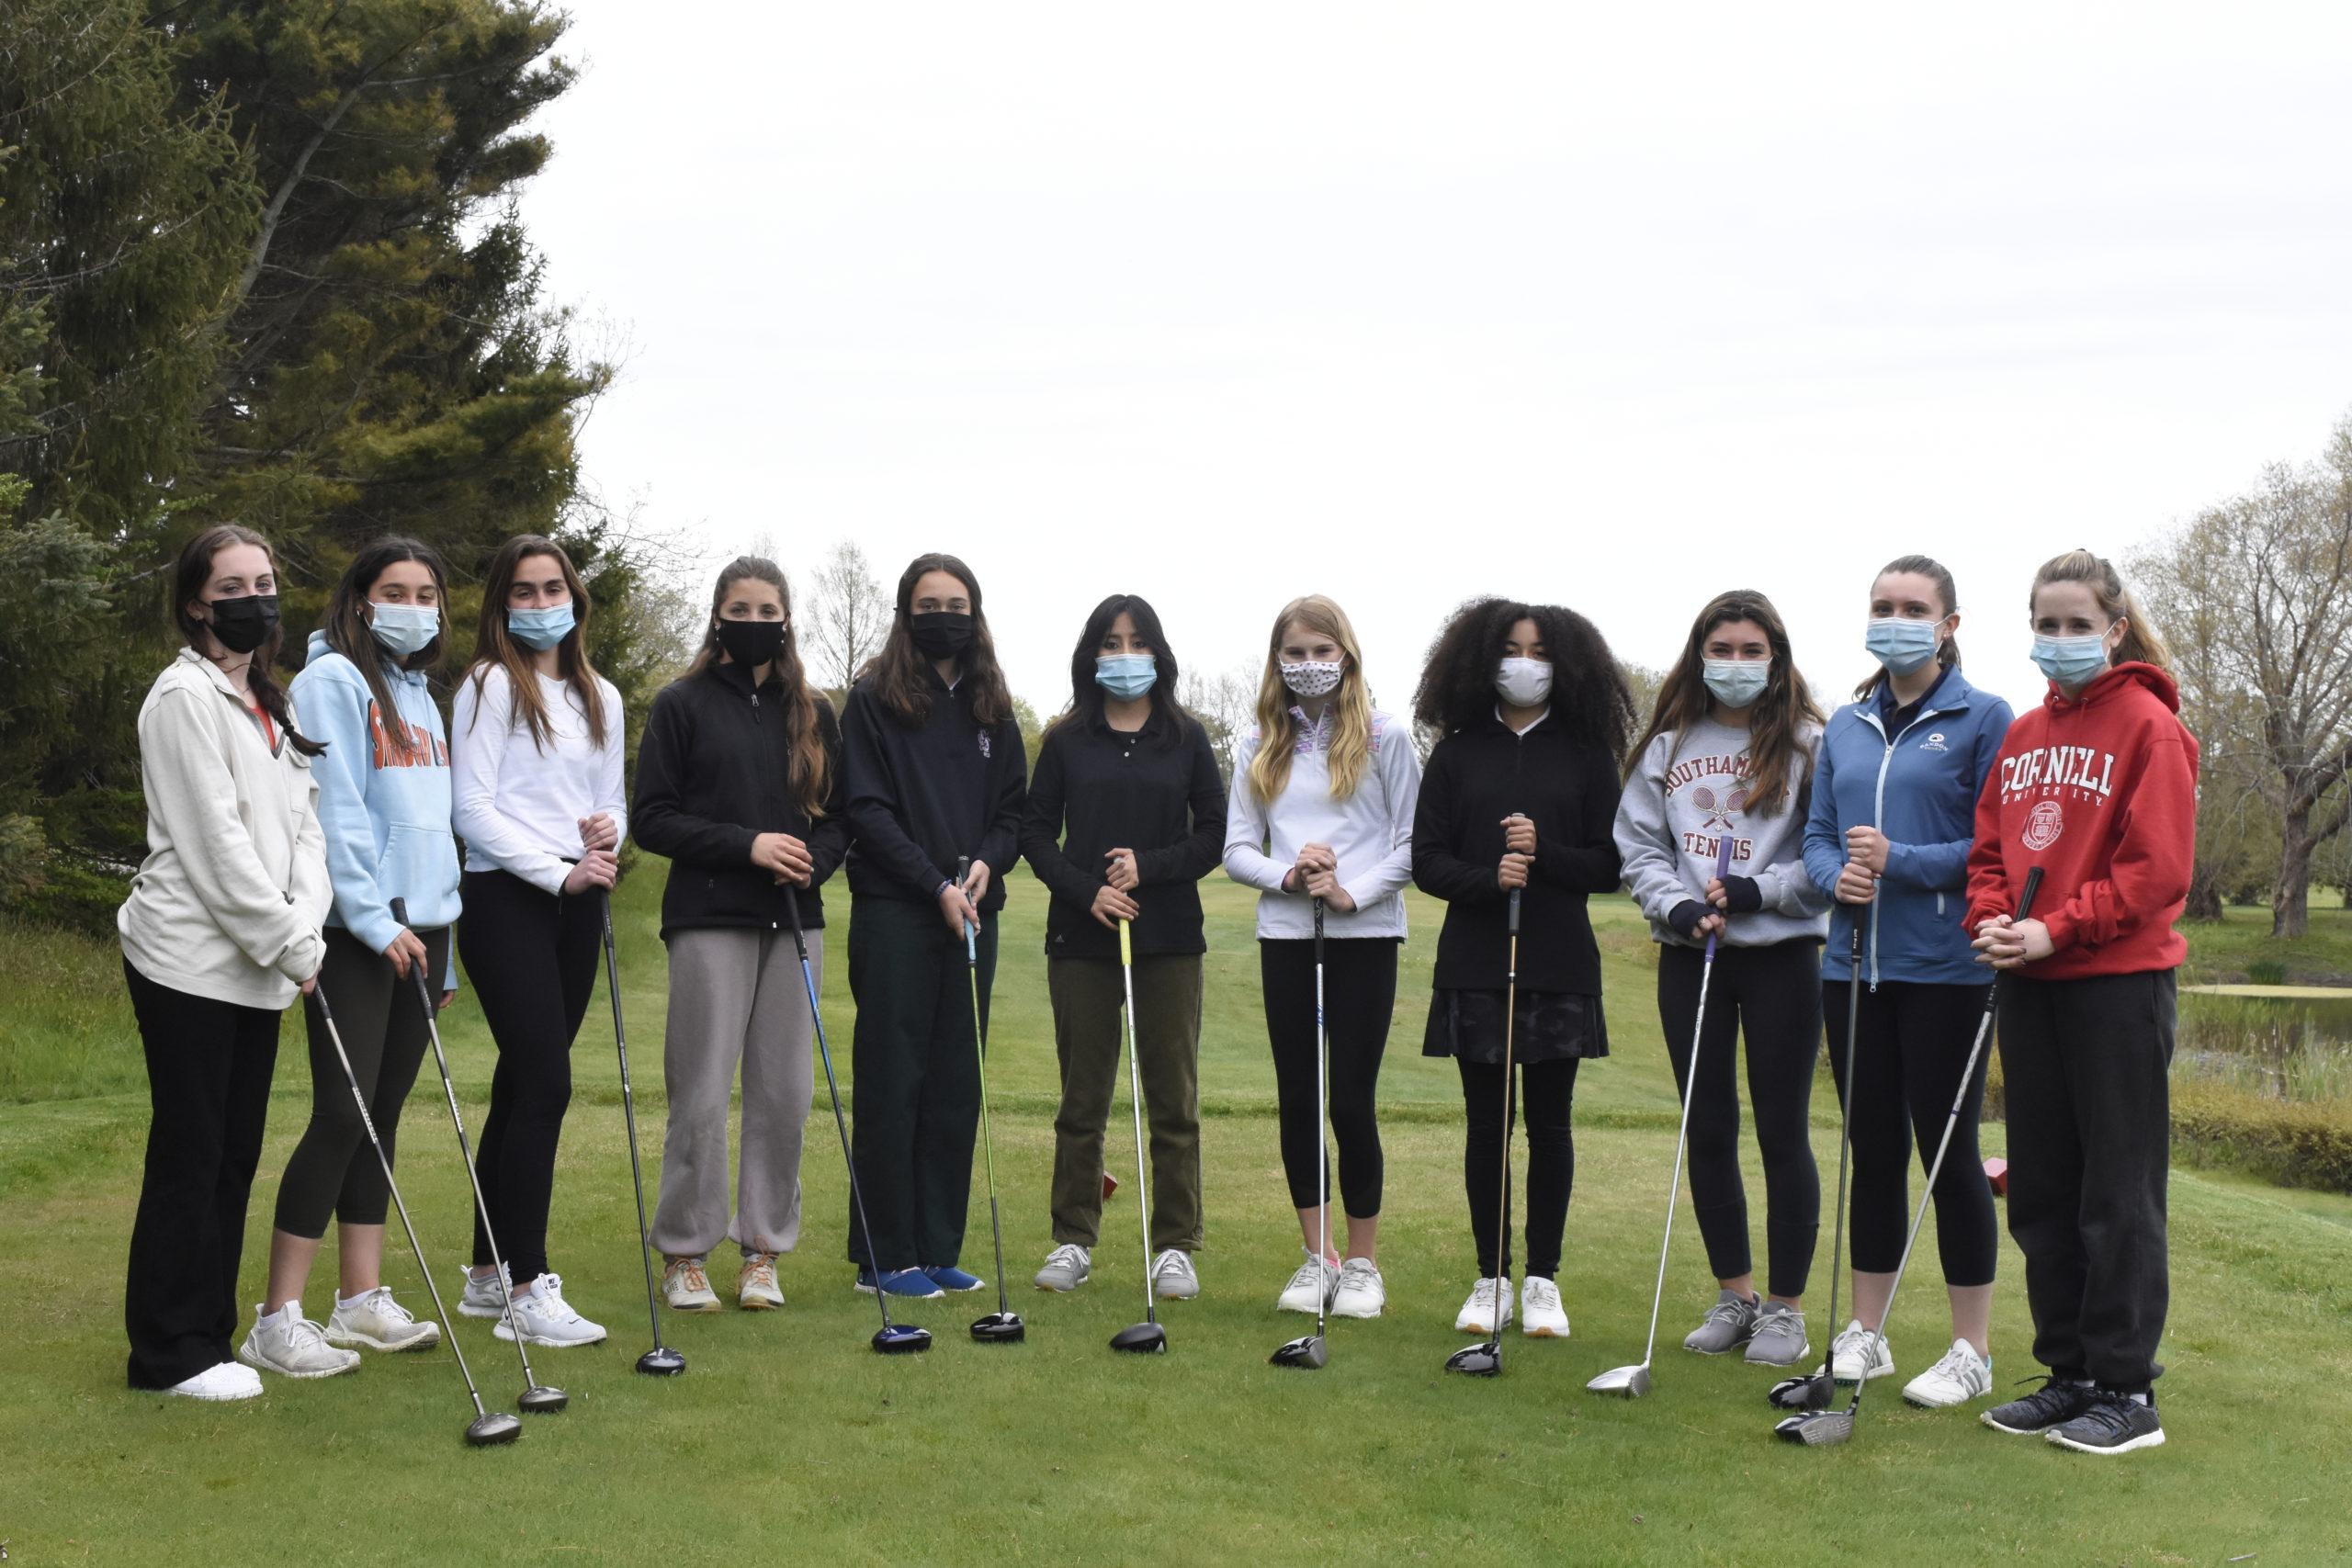 The Southampton-Pierson girls golf team this season comprises of, from left, Isabel Doyle, Eleana Merola, Sophia Beech, Vivienne Archer, Emma Vail, Zaida Triffit, Jillian Swiatocha, Ella Coady, Caroline Wilutis, Haley Marcincuk and Keira Gil.